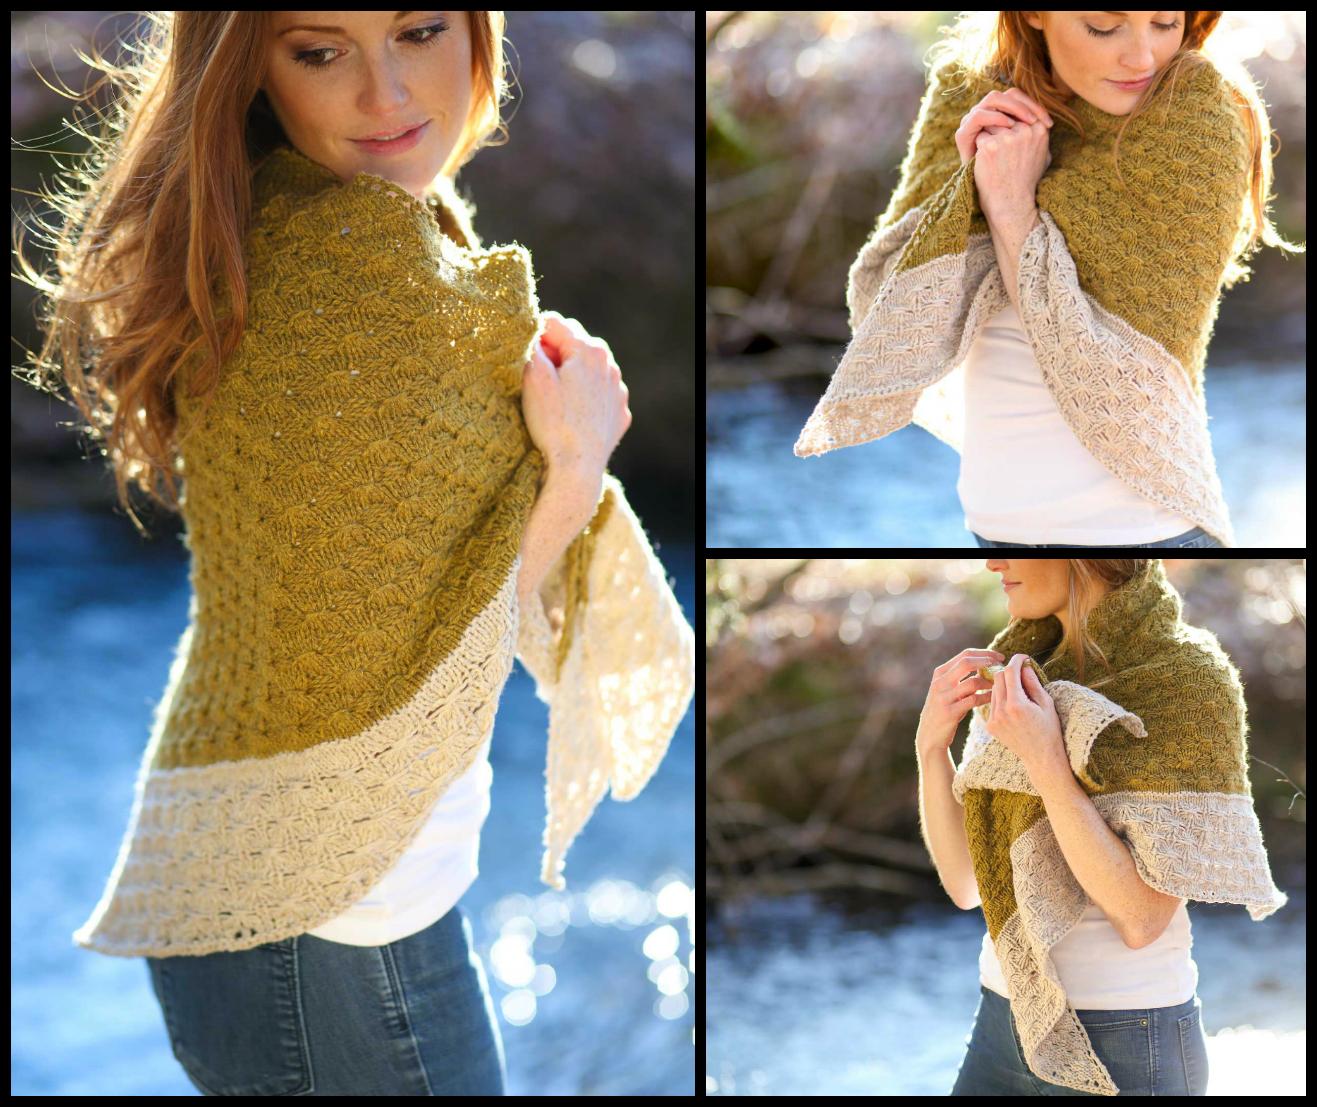 Amberle Knitting Pattern by Shannon Cook on VeryShannon.com #amberleshawl